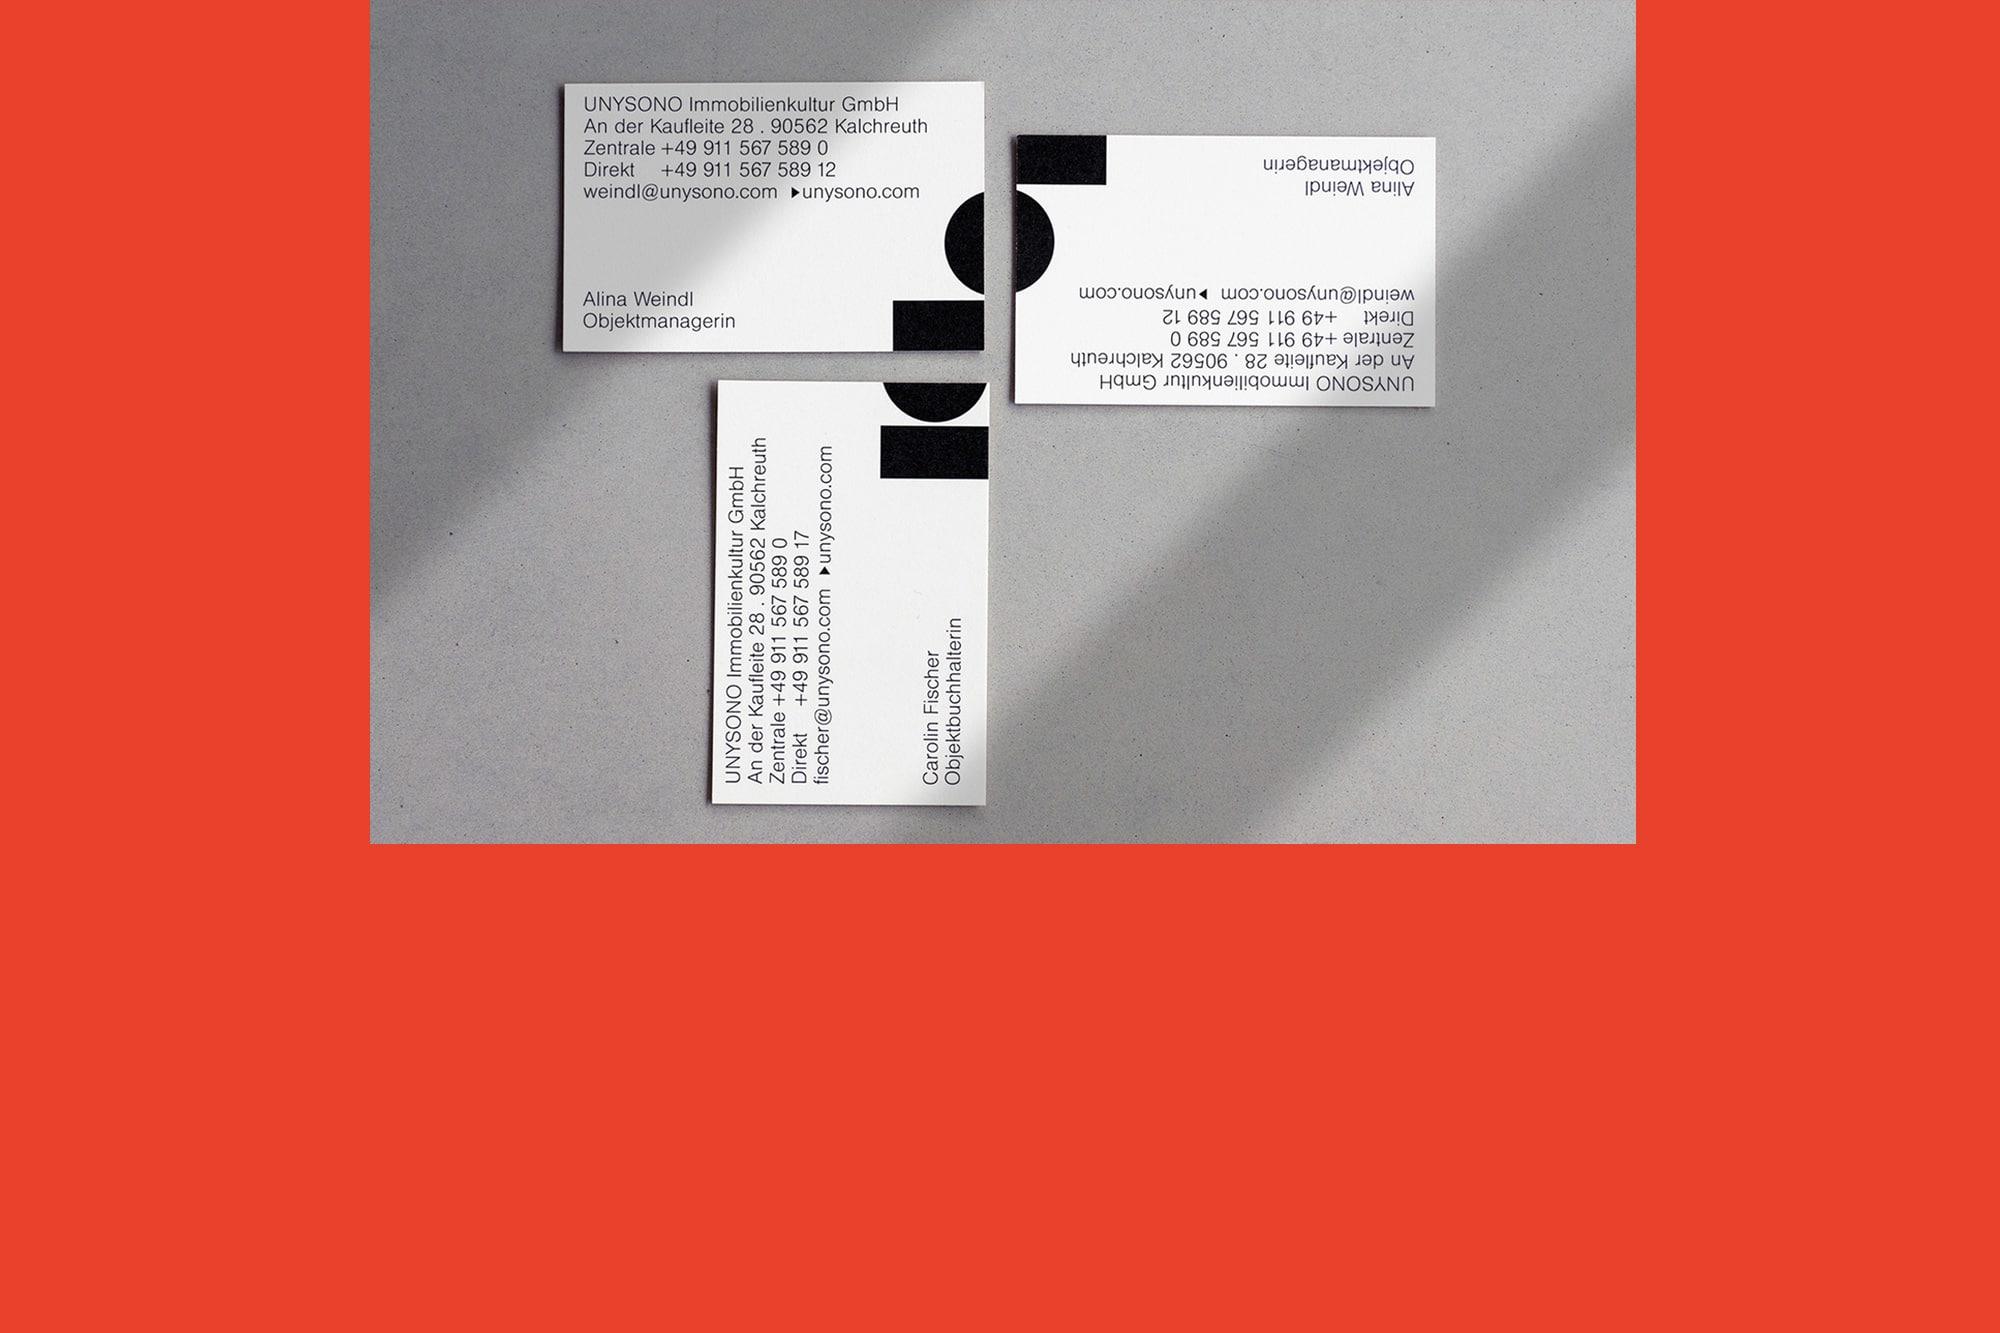 planx-UNYSONO-CorporateDesign-Cards02